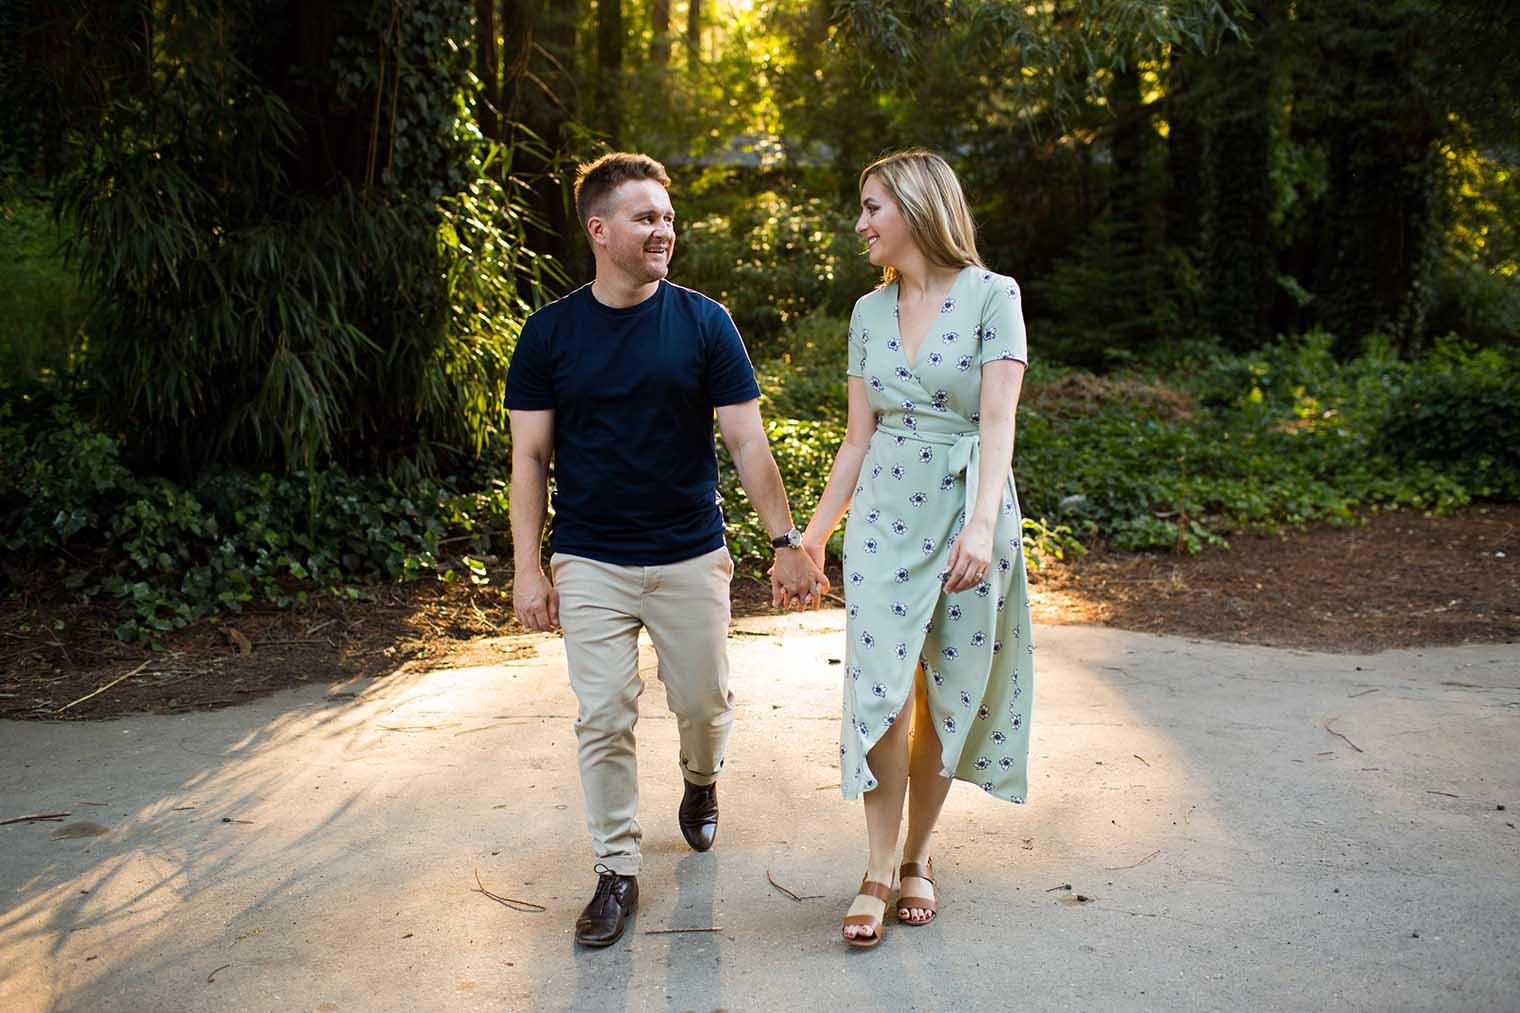 Engagement Photos at Sonoma Coast State Park